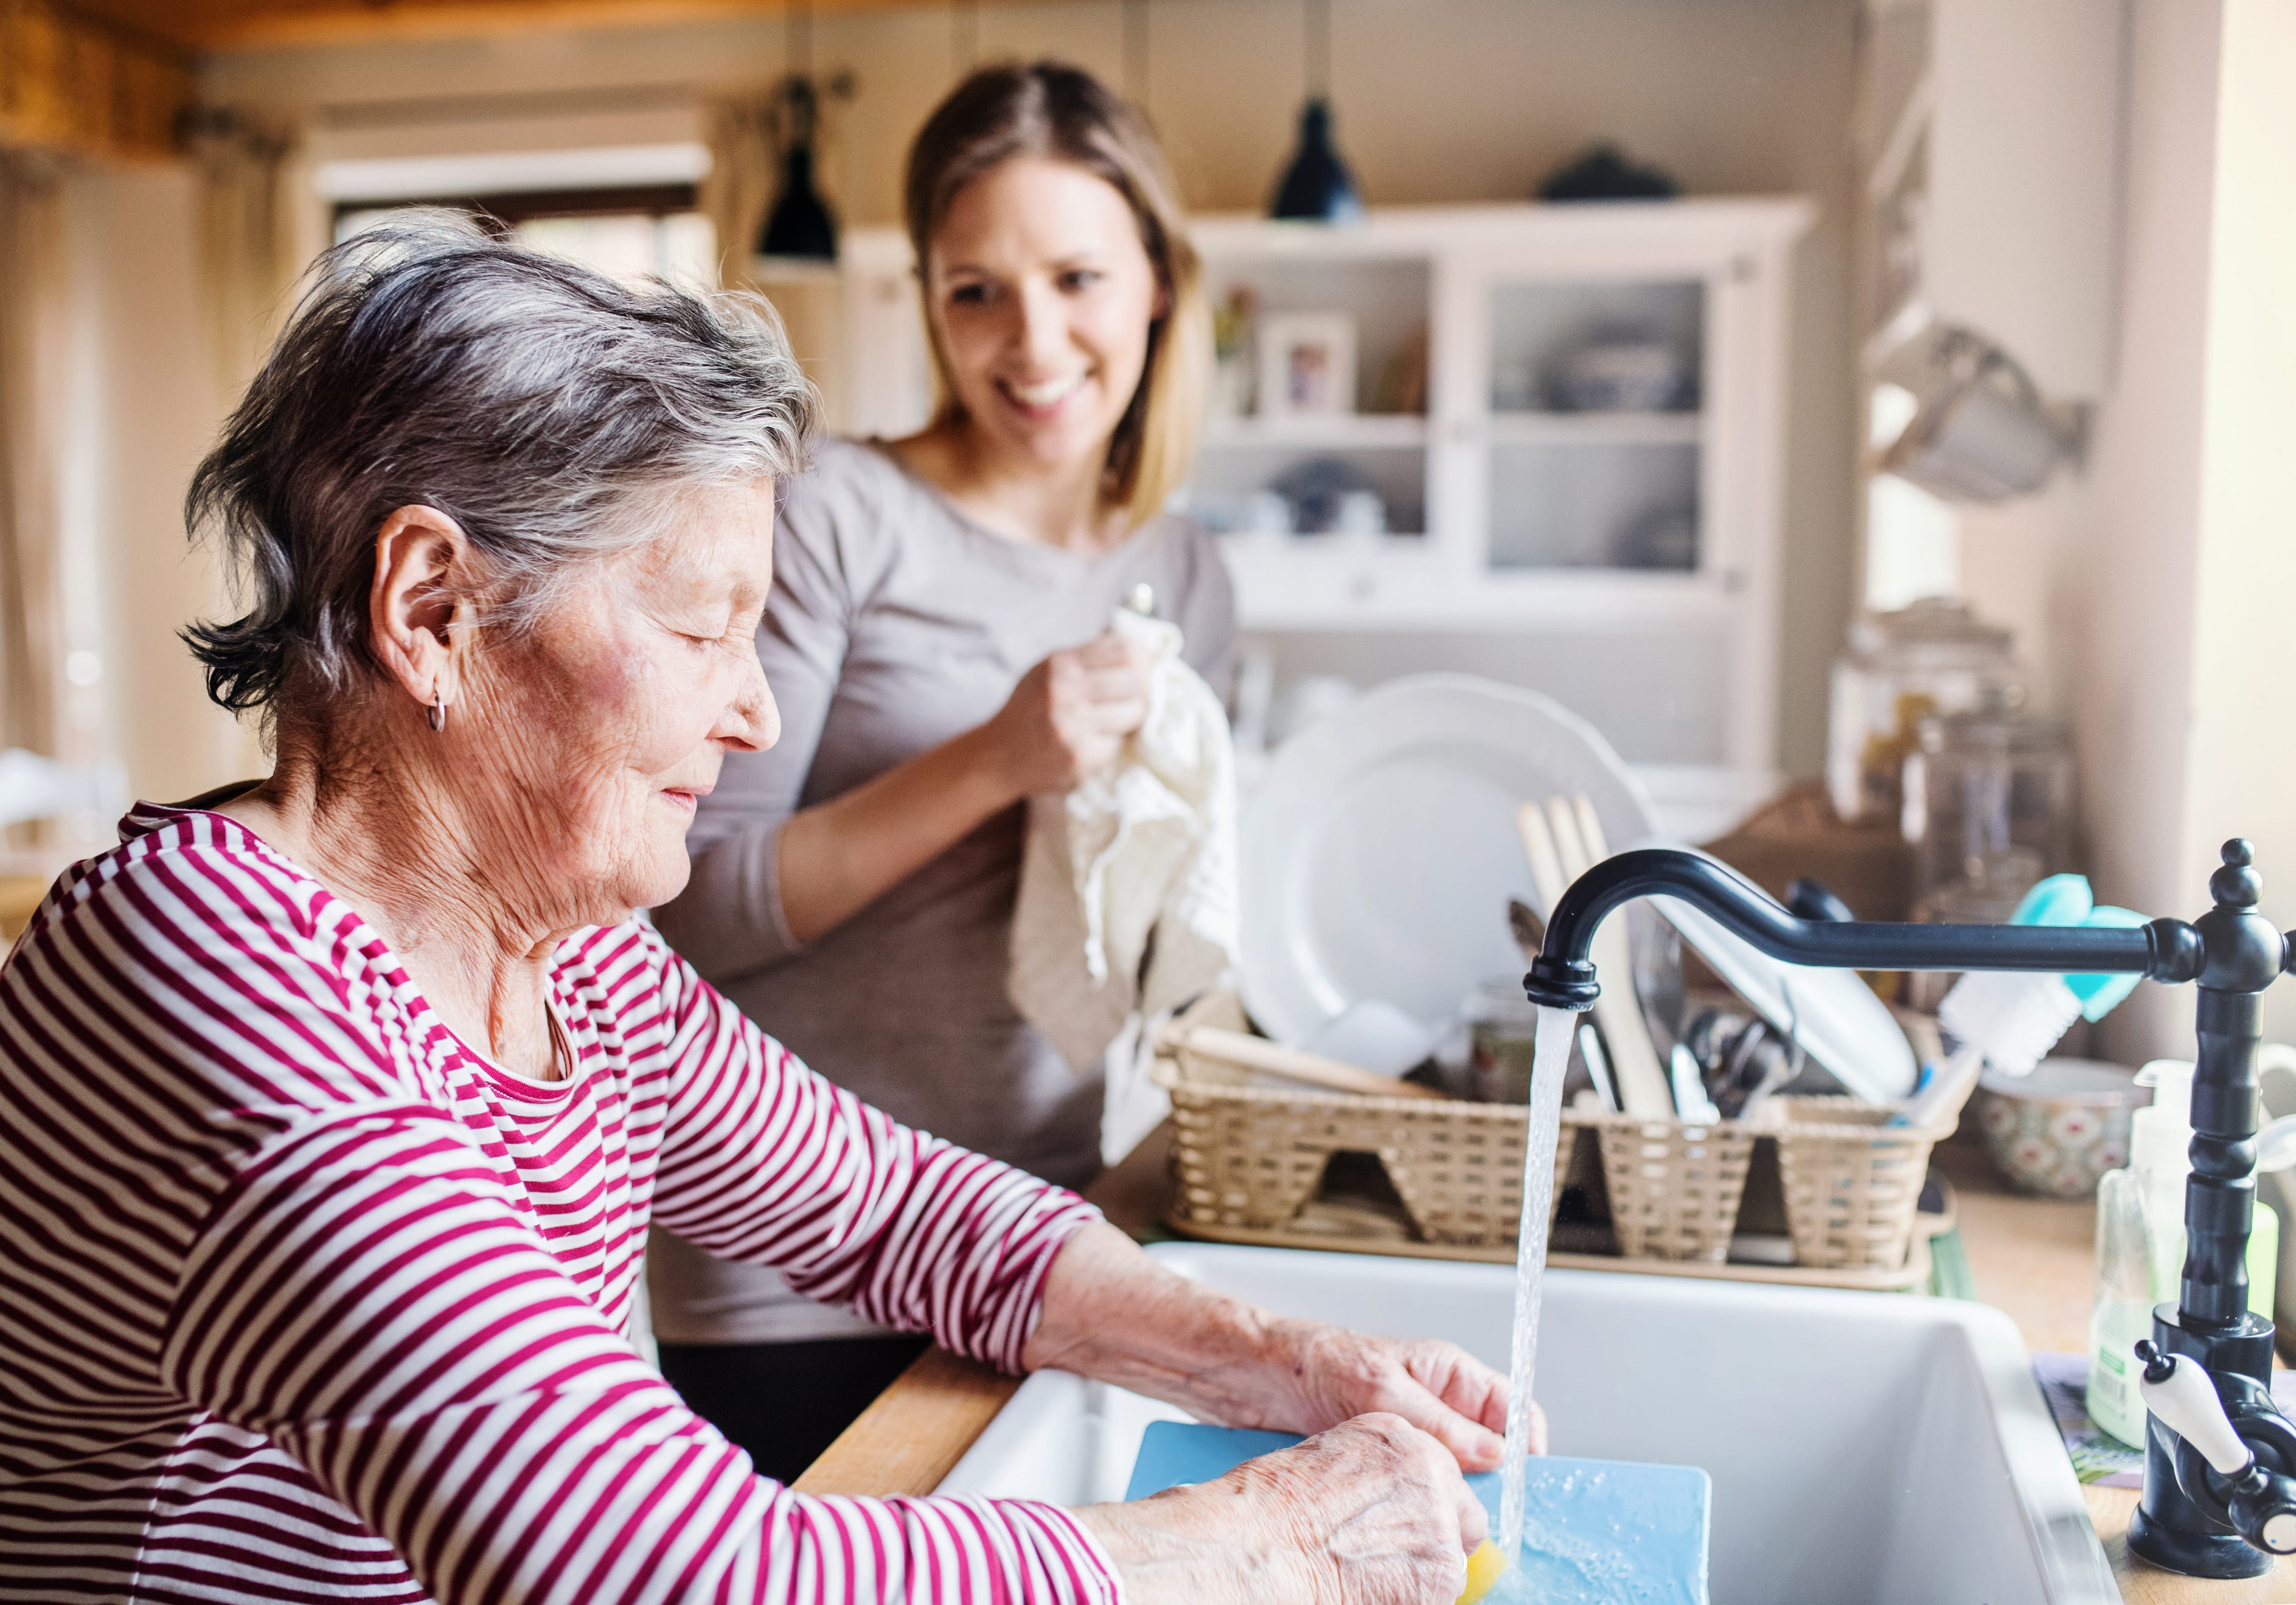 grandma washing dishes